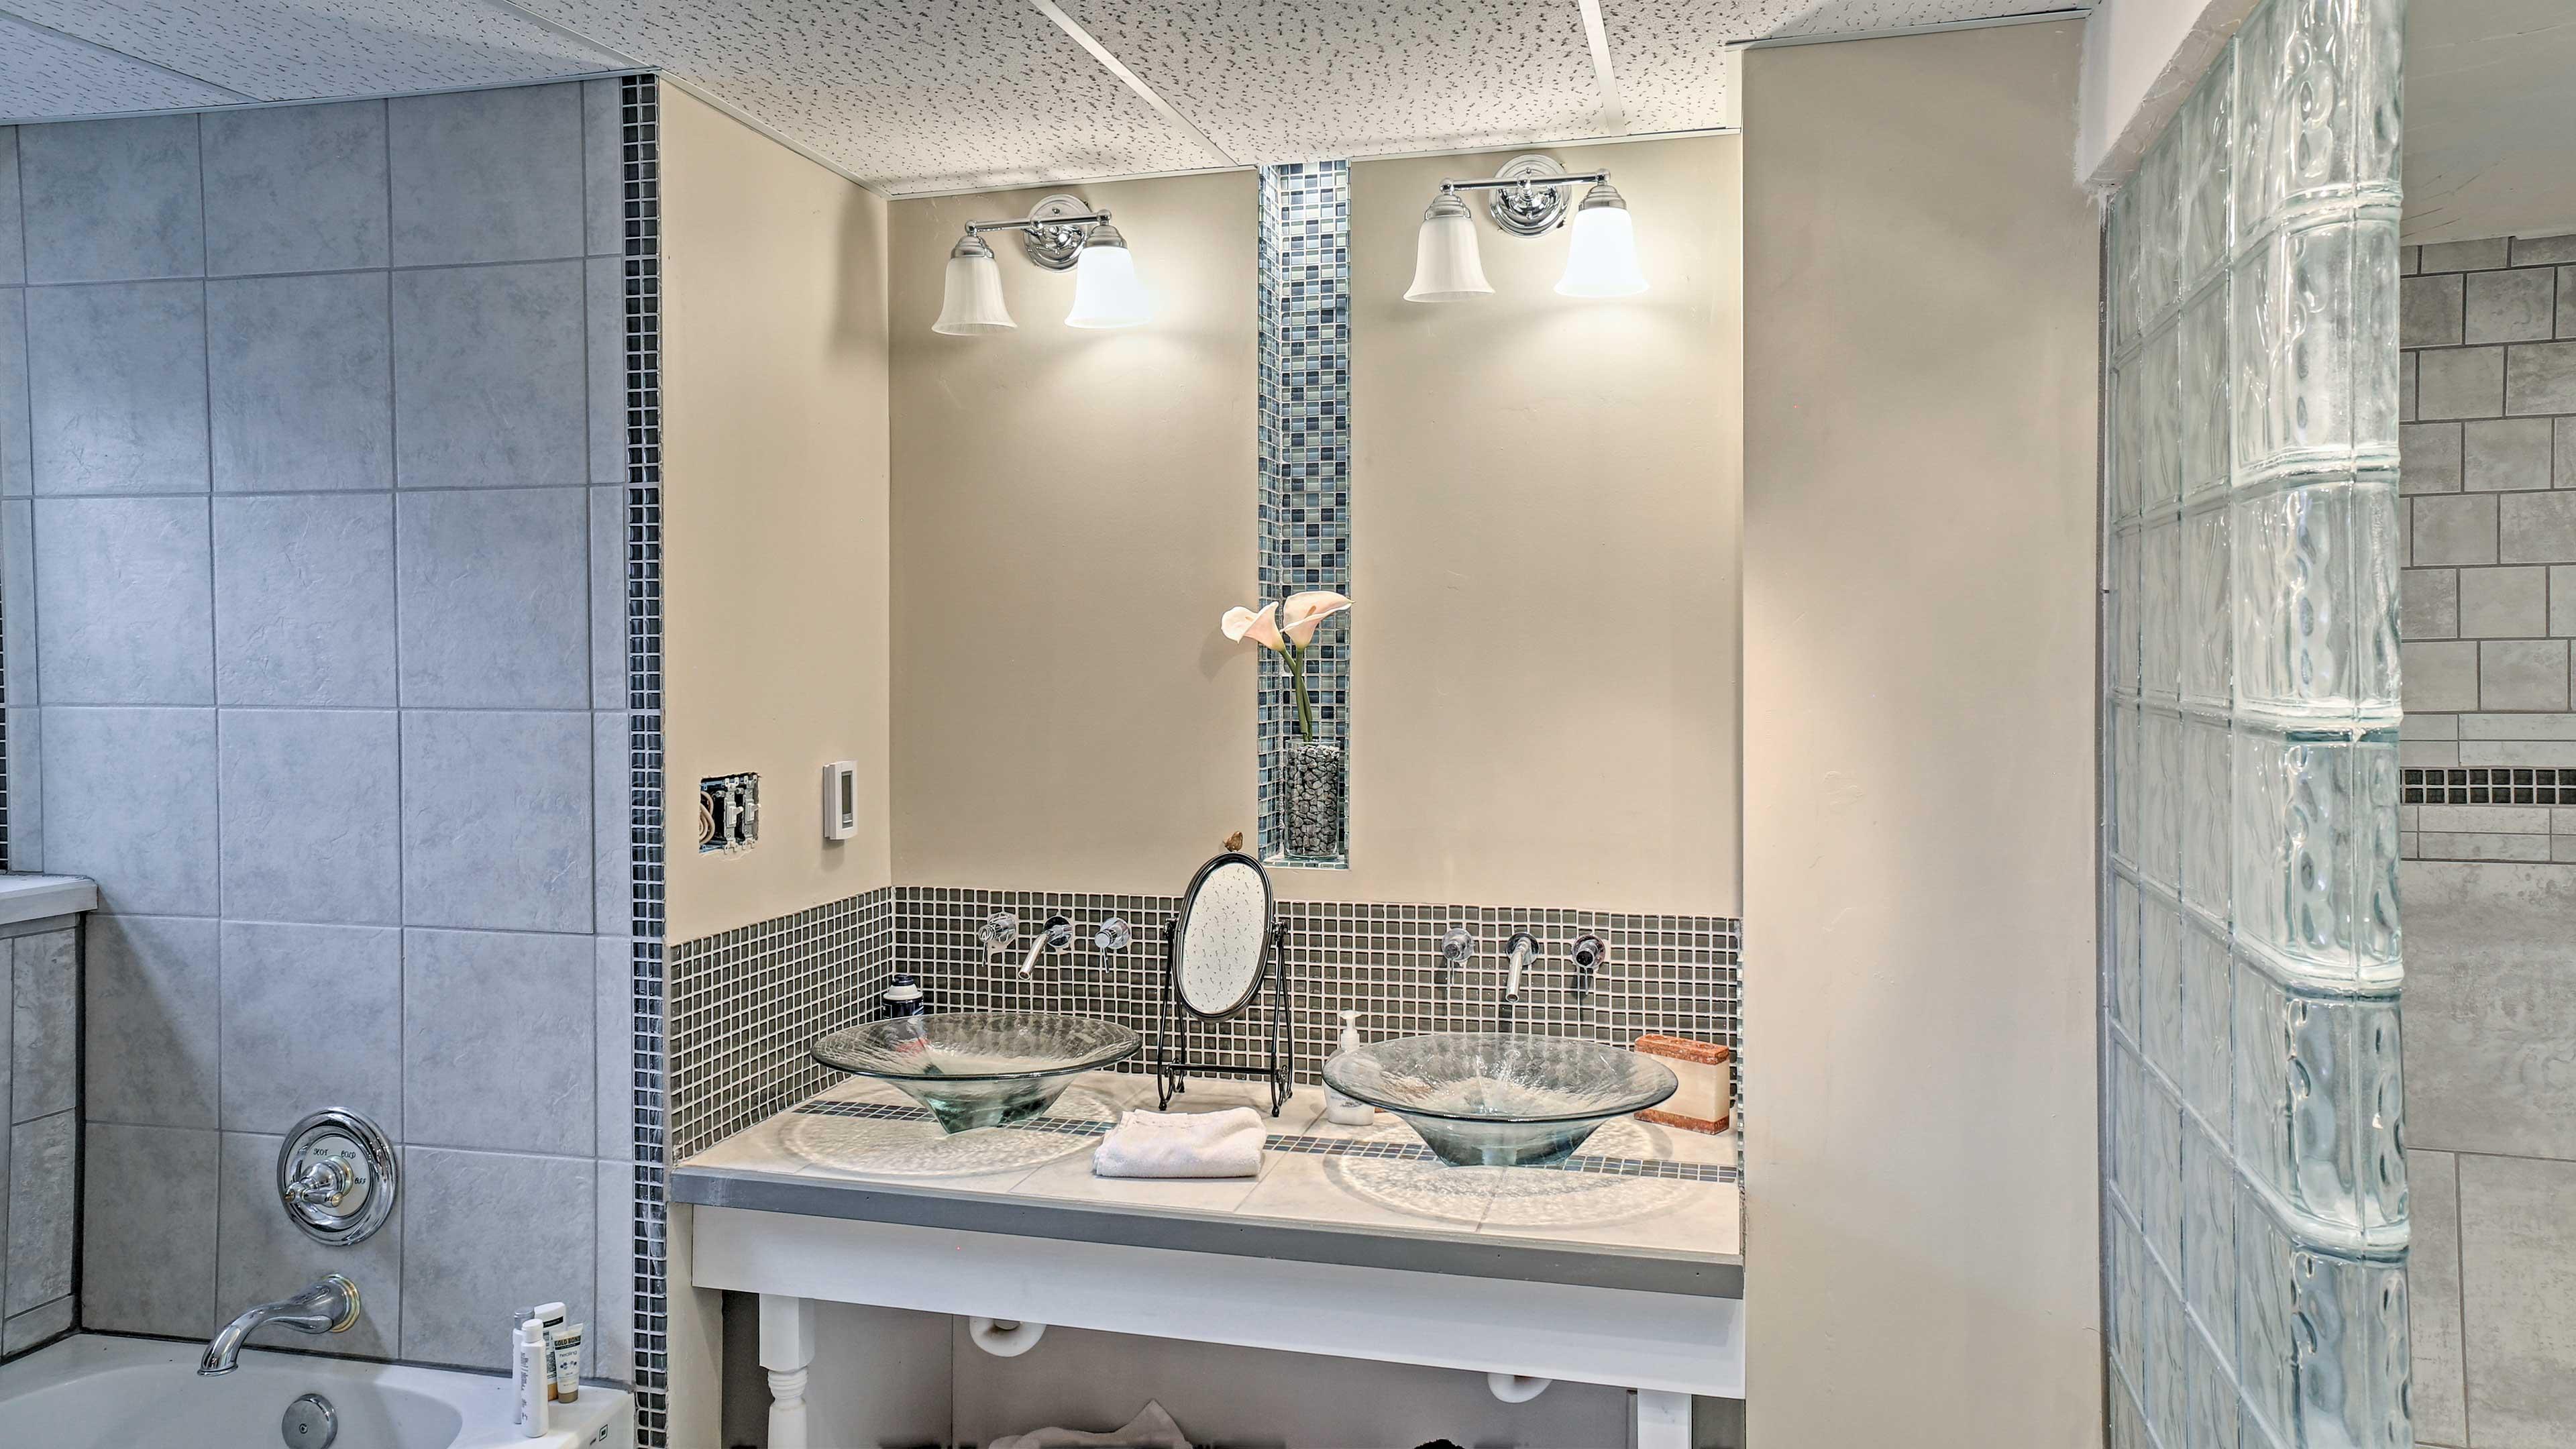 Pour yourself a bubble bath or enjoy a shower in the master's en-suite bathroom.